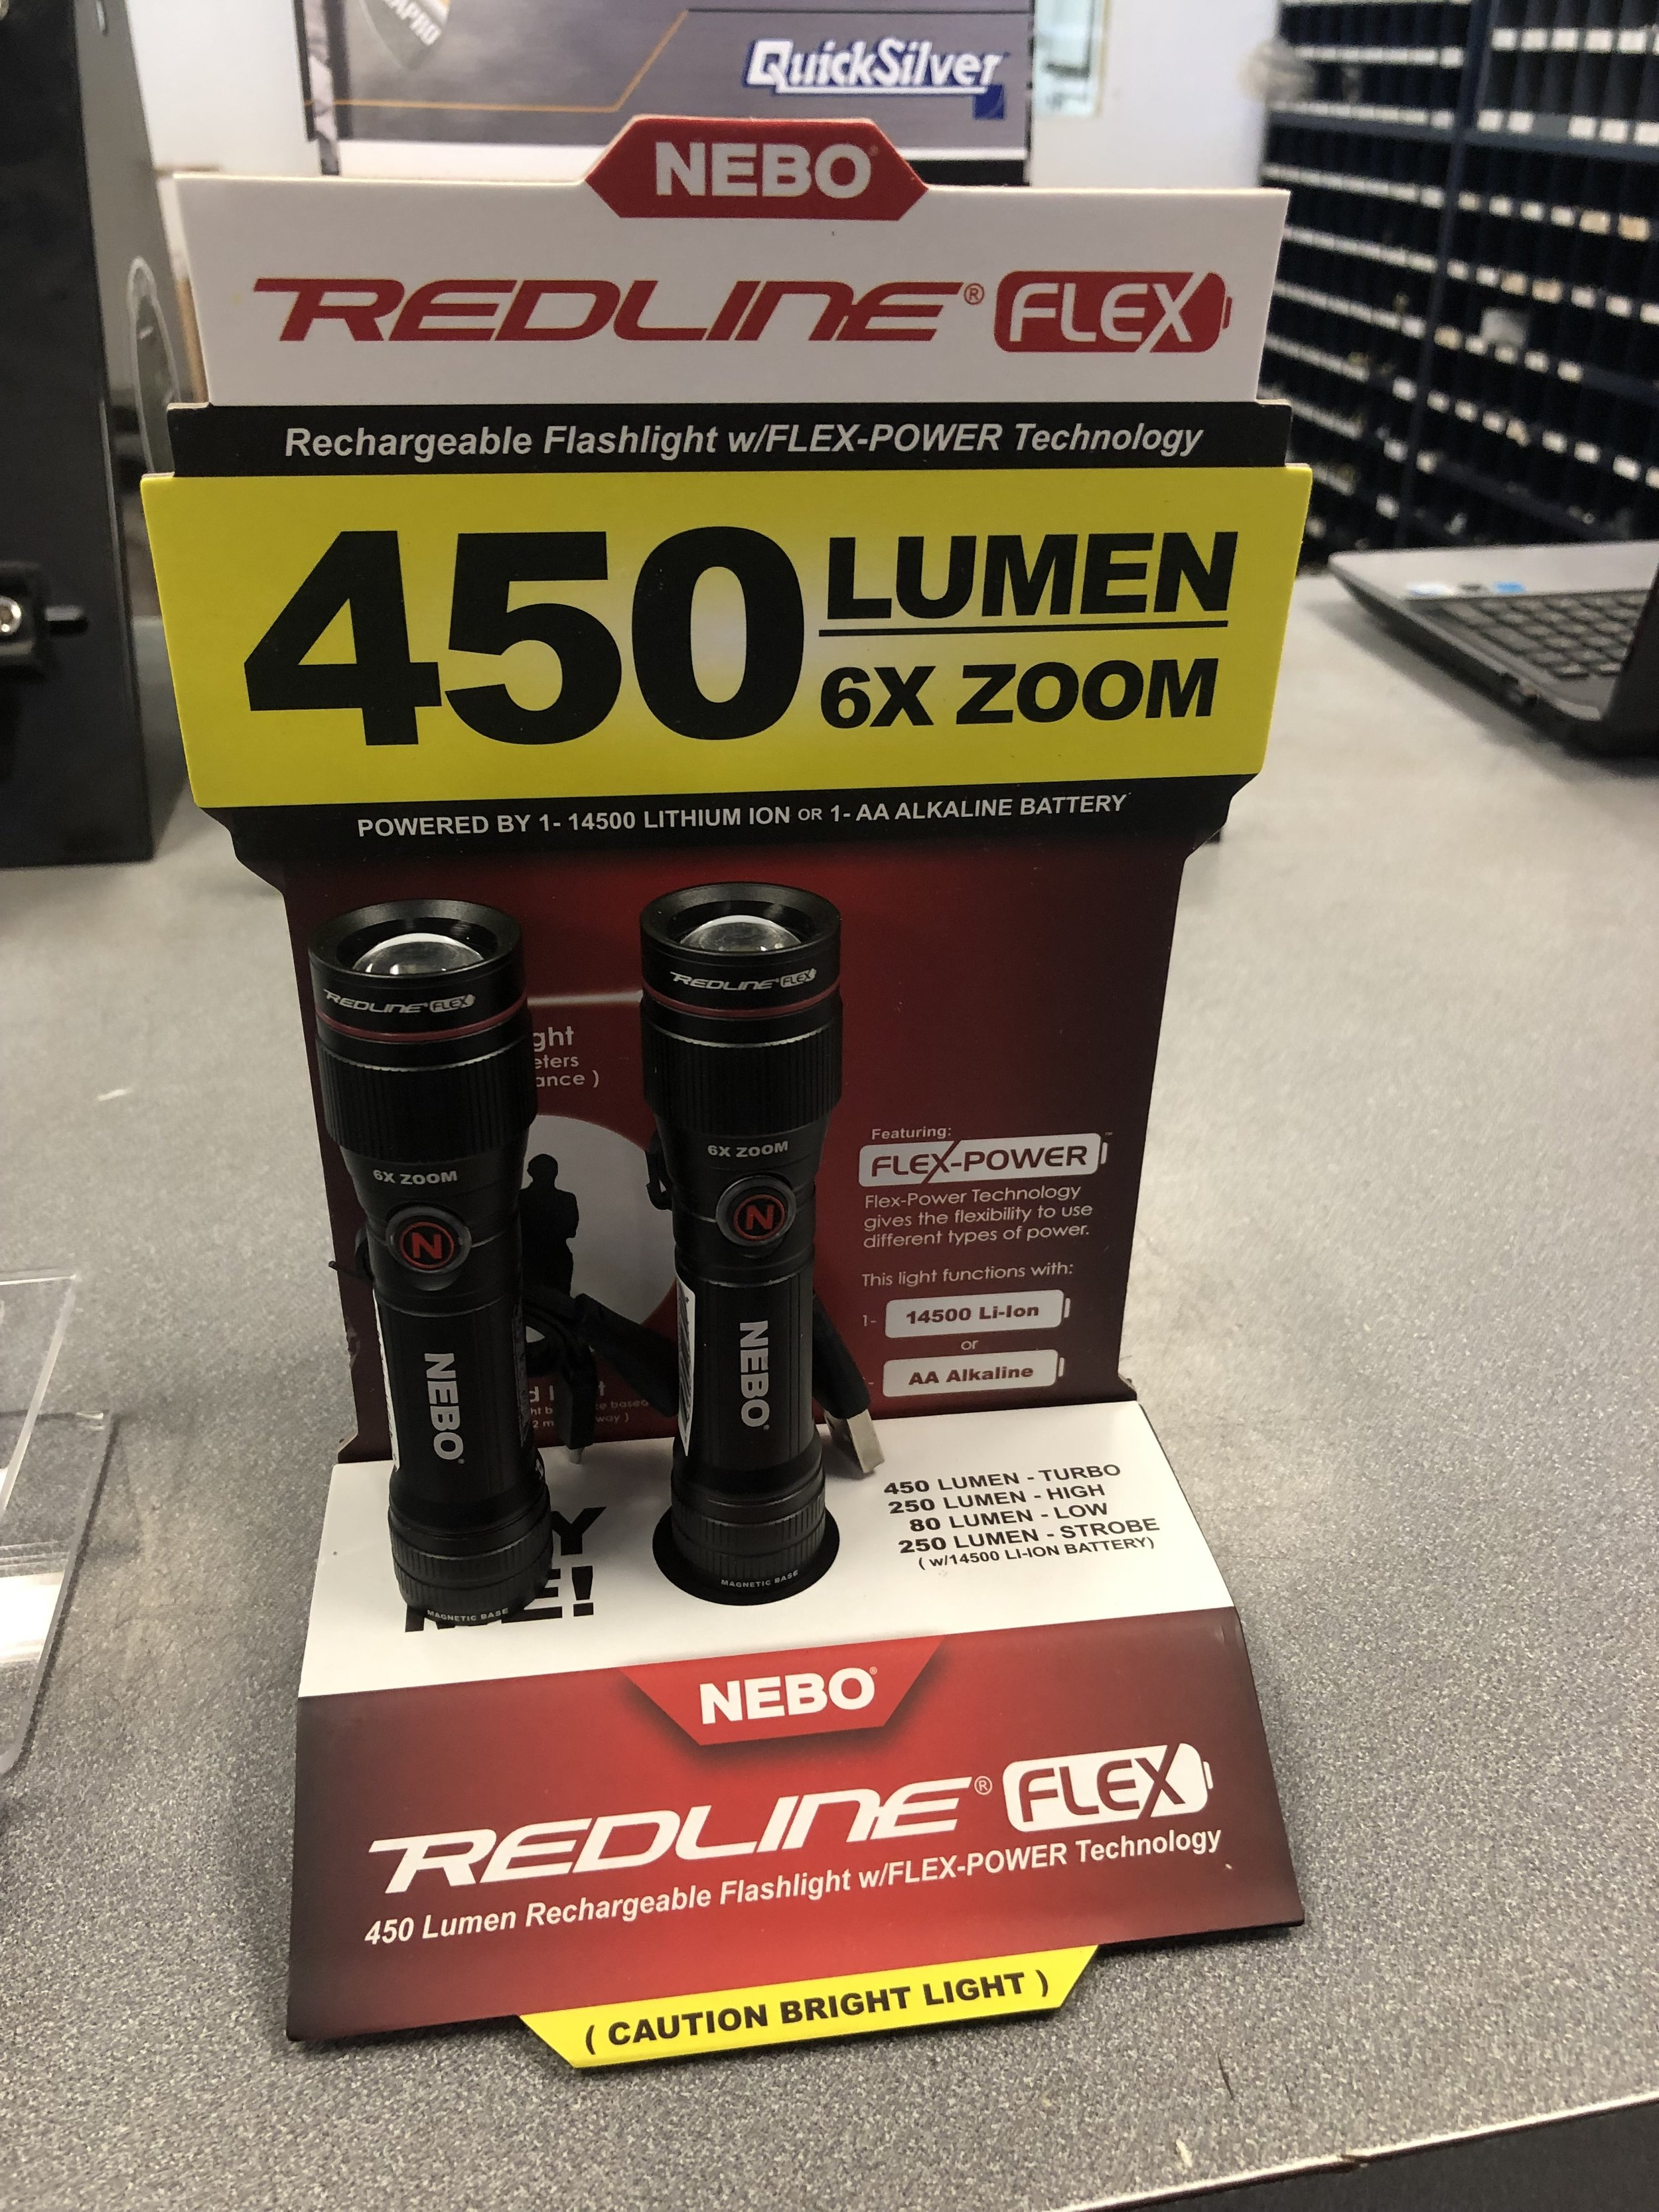 Redline Flex $21.99